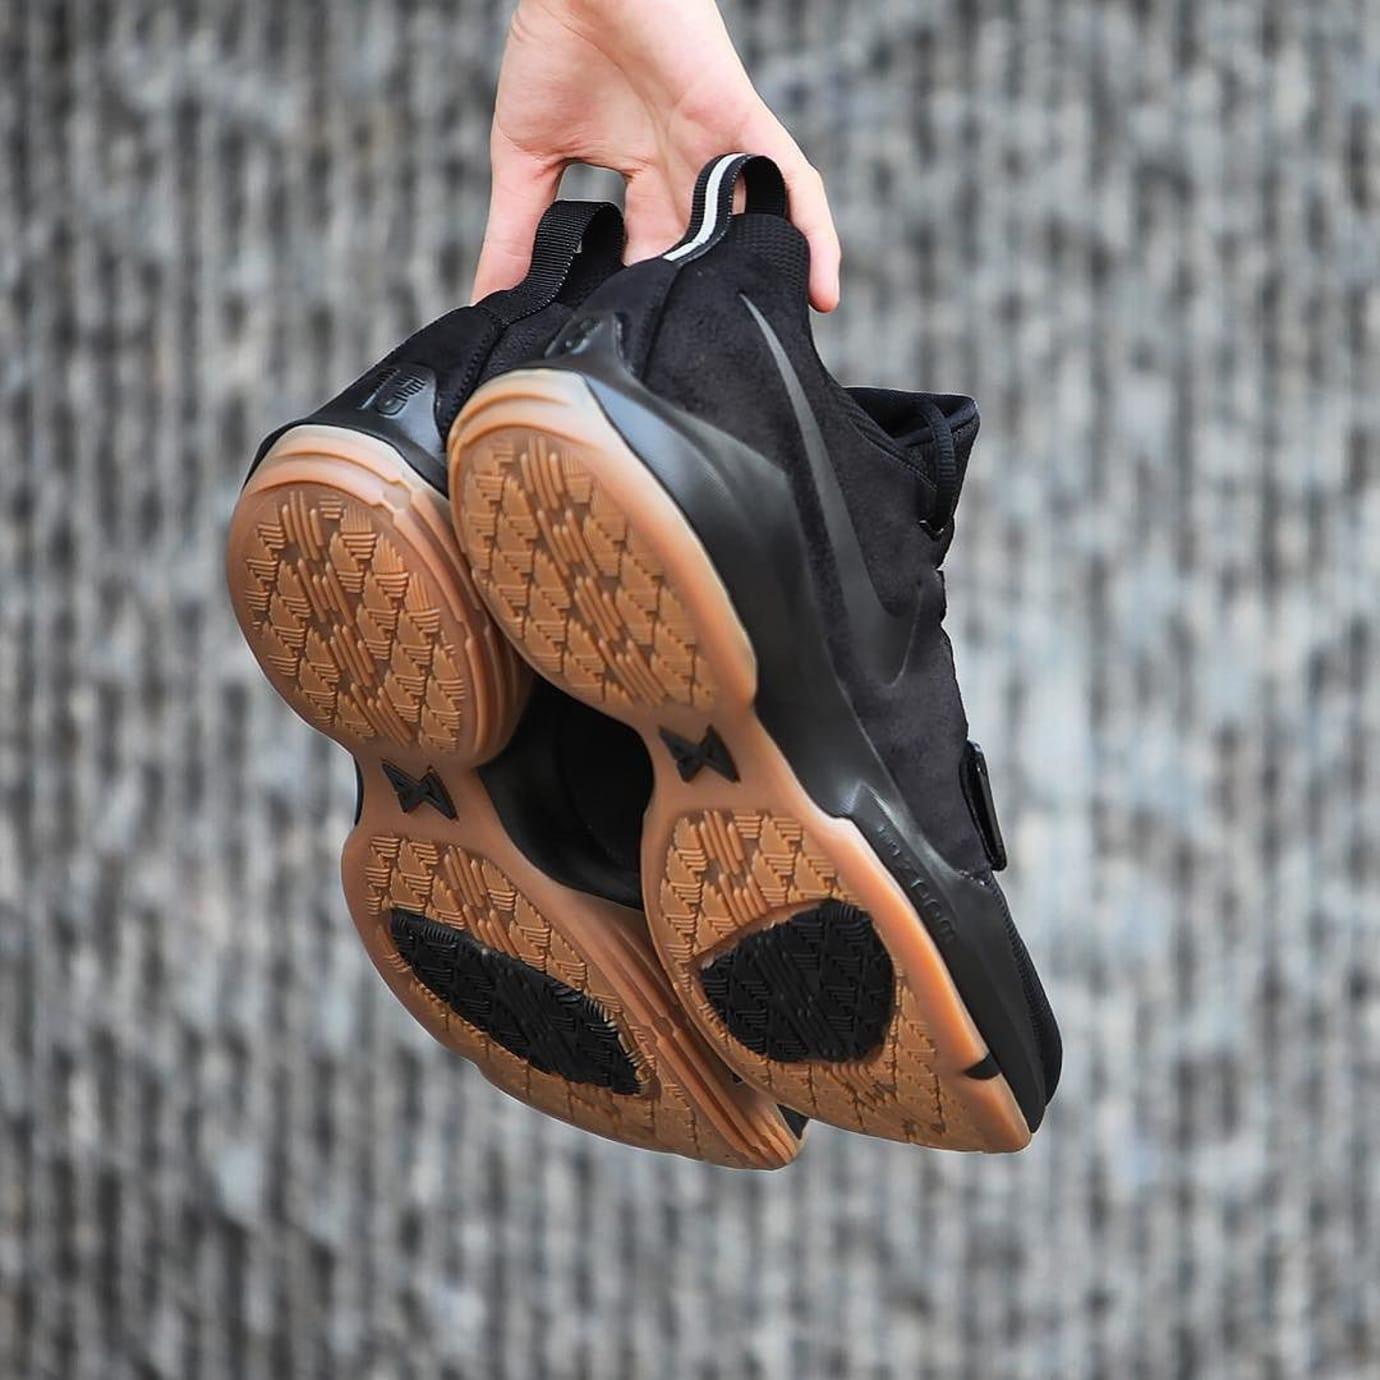 Nike PG1 Black Gum Release Date 878627-004 (18)